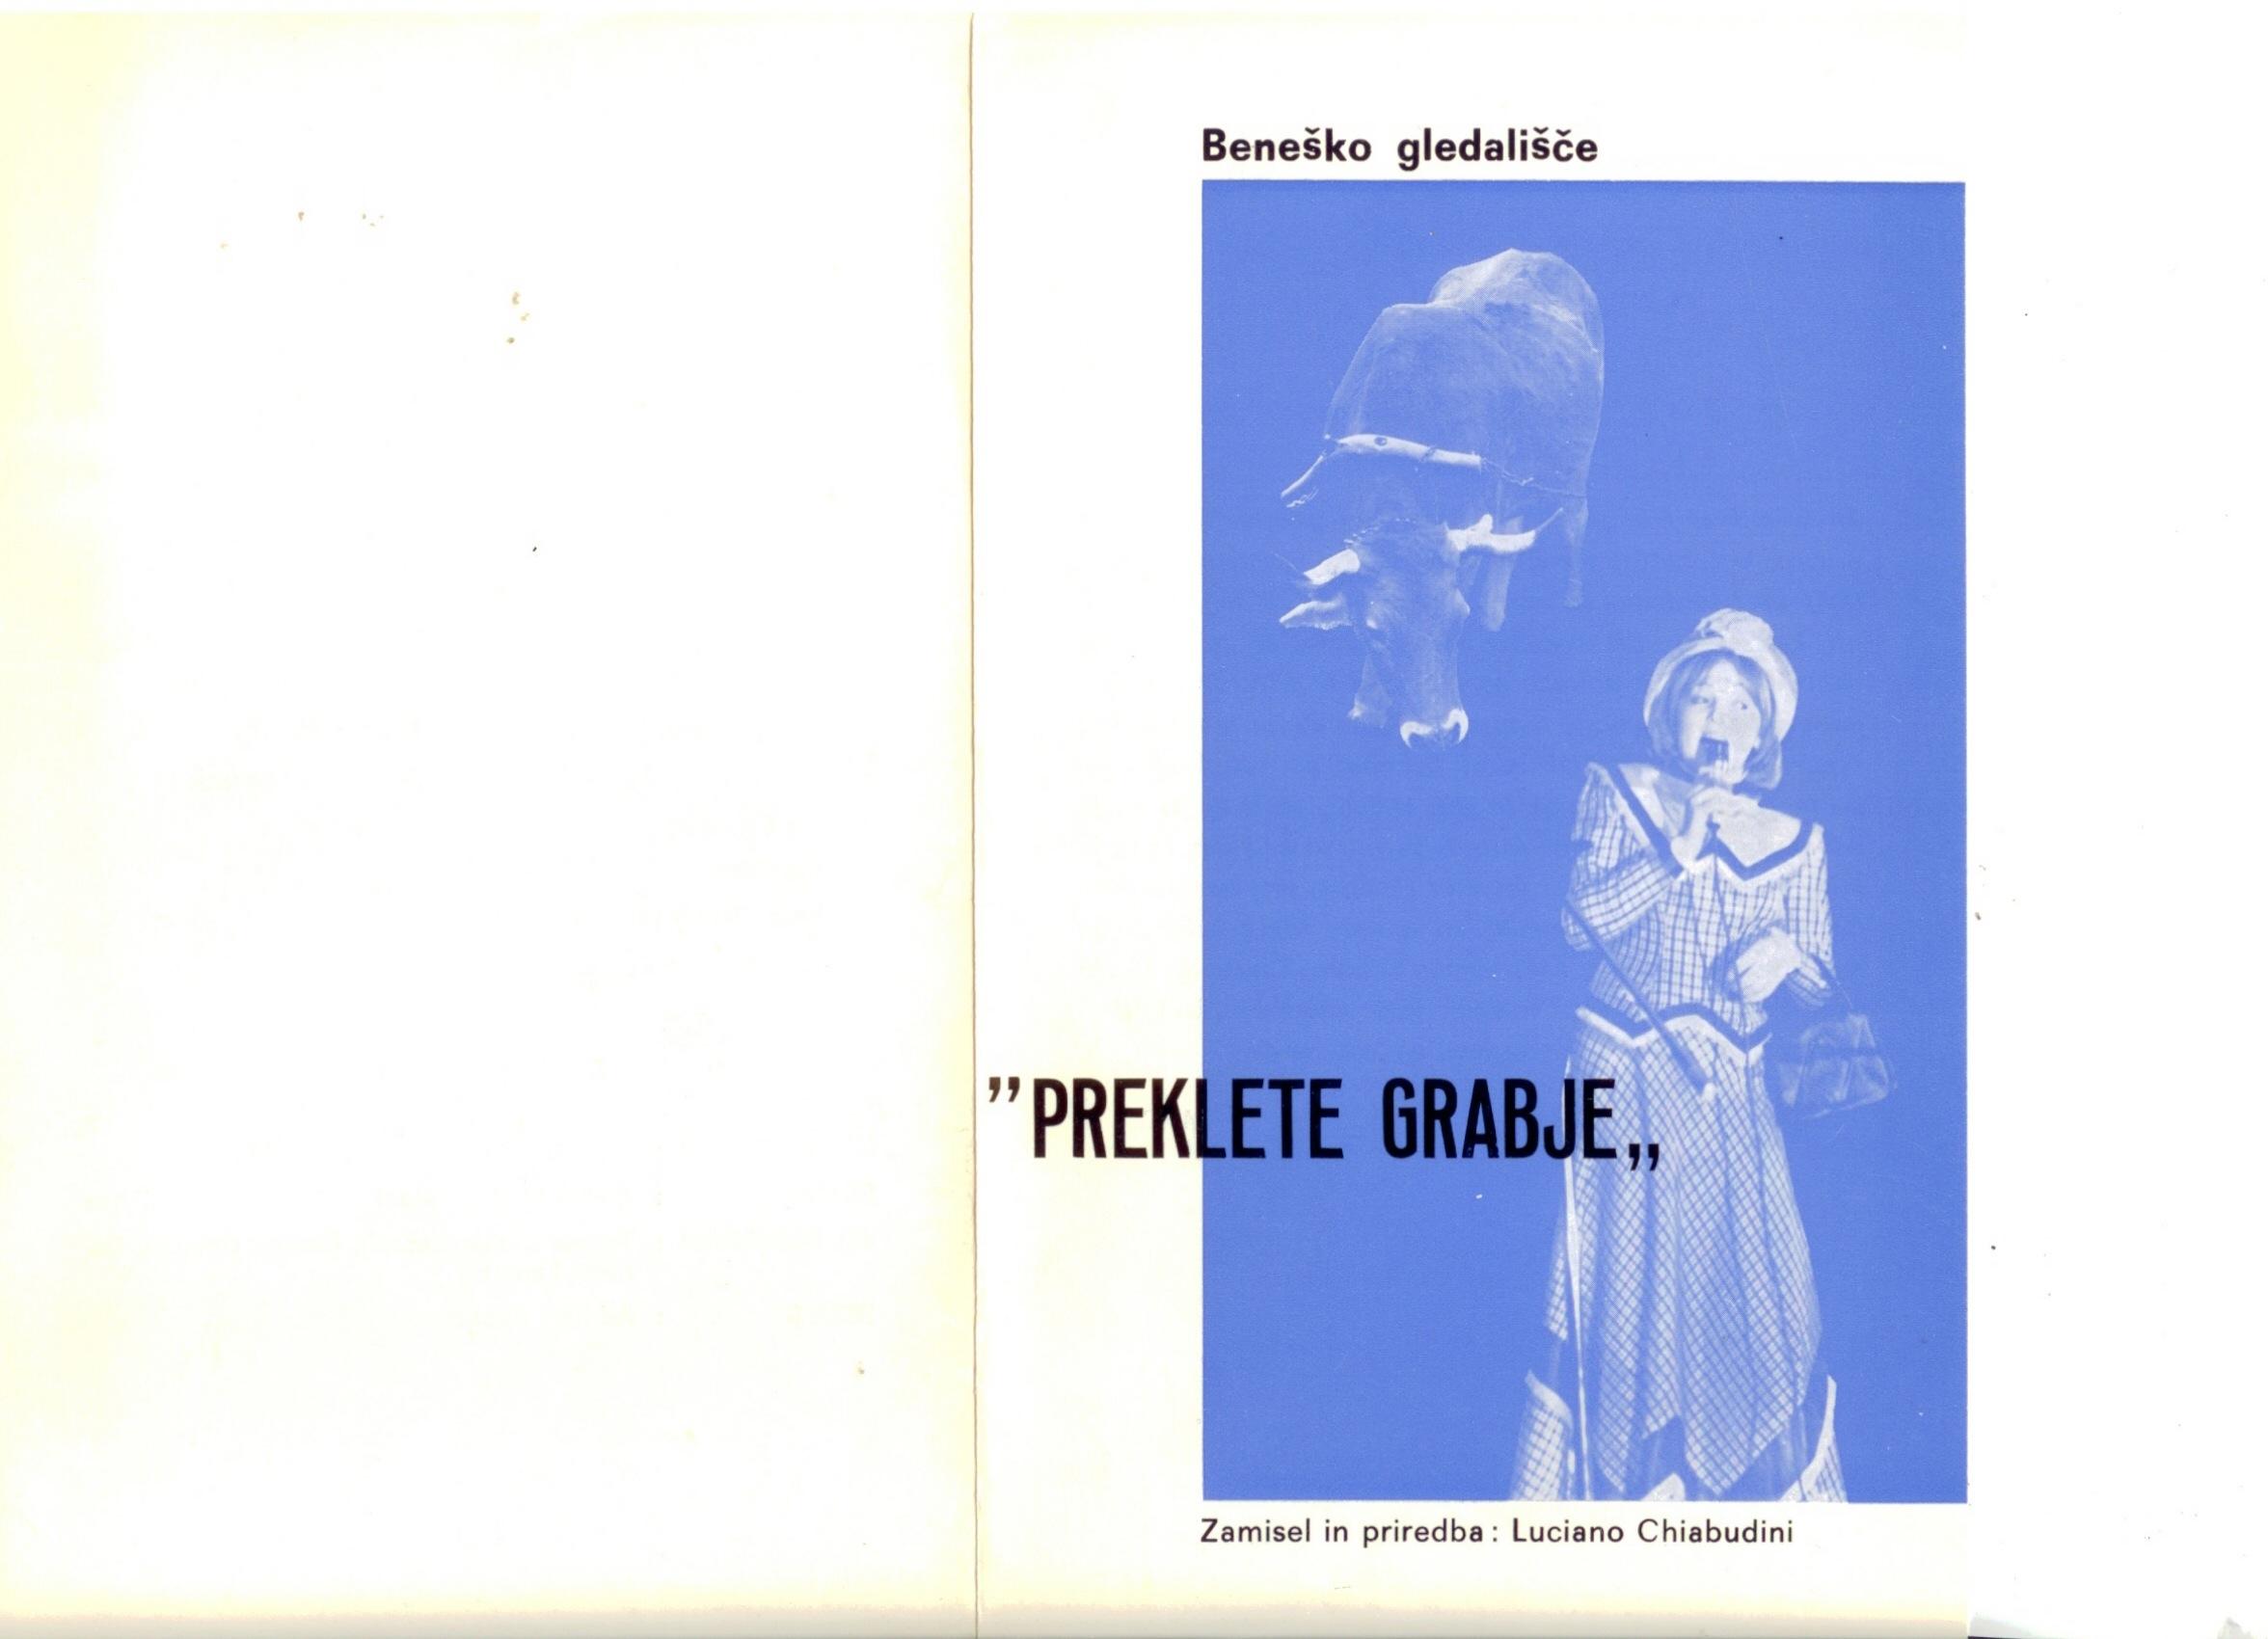 1984 - Preklete grabje - Foglio sala 1